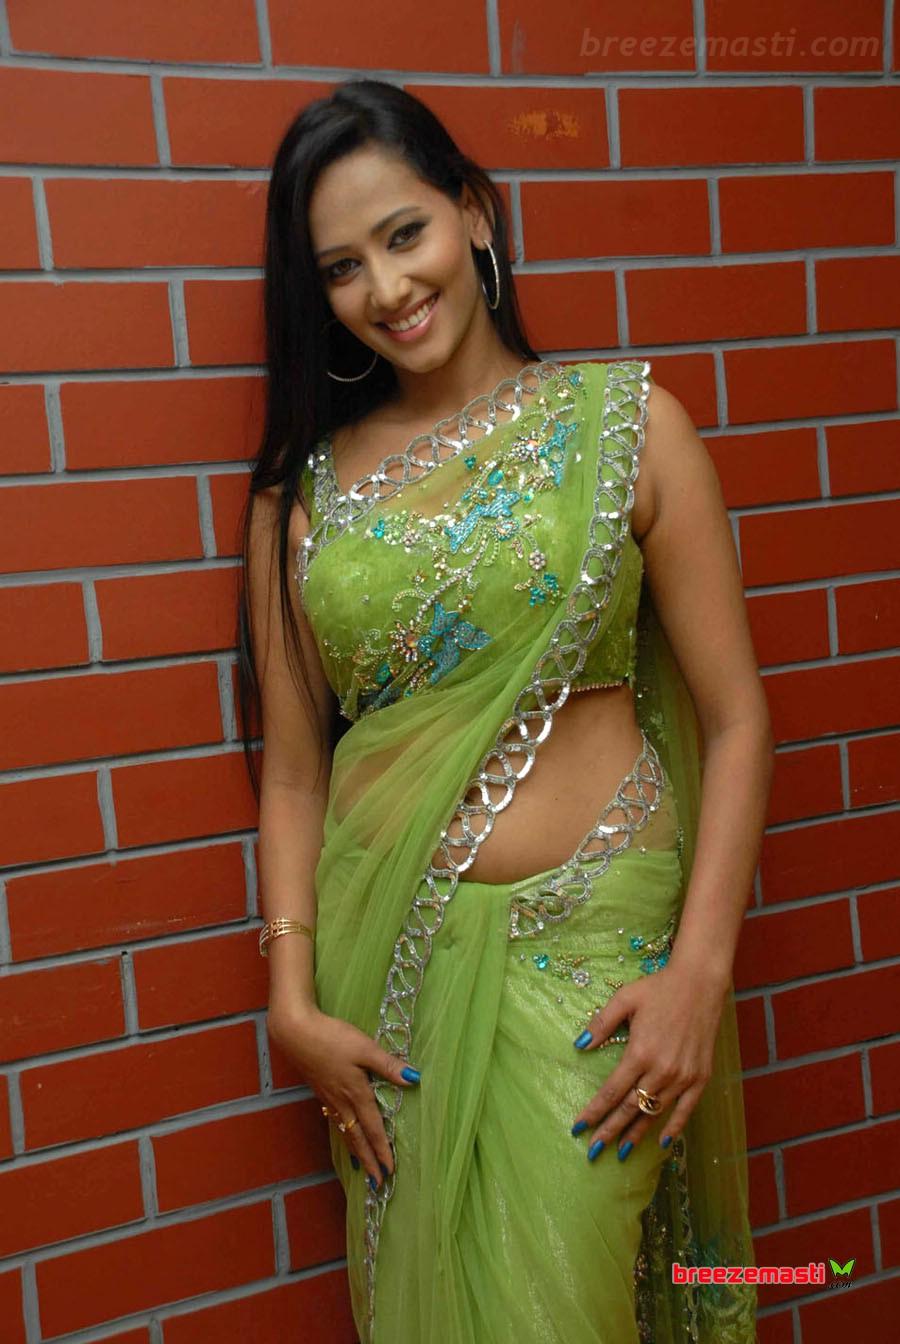 Desi hindi mallu masala aunty collection part 8 - 4 1